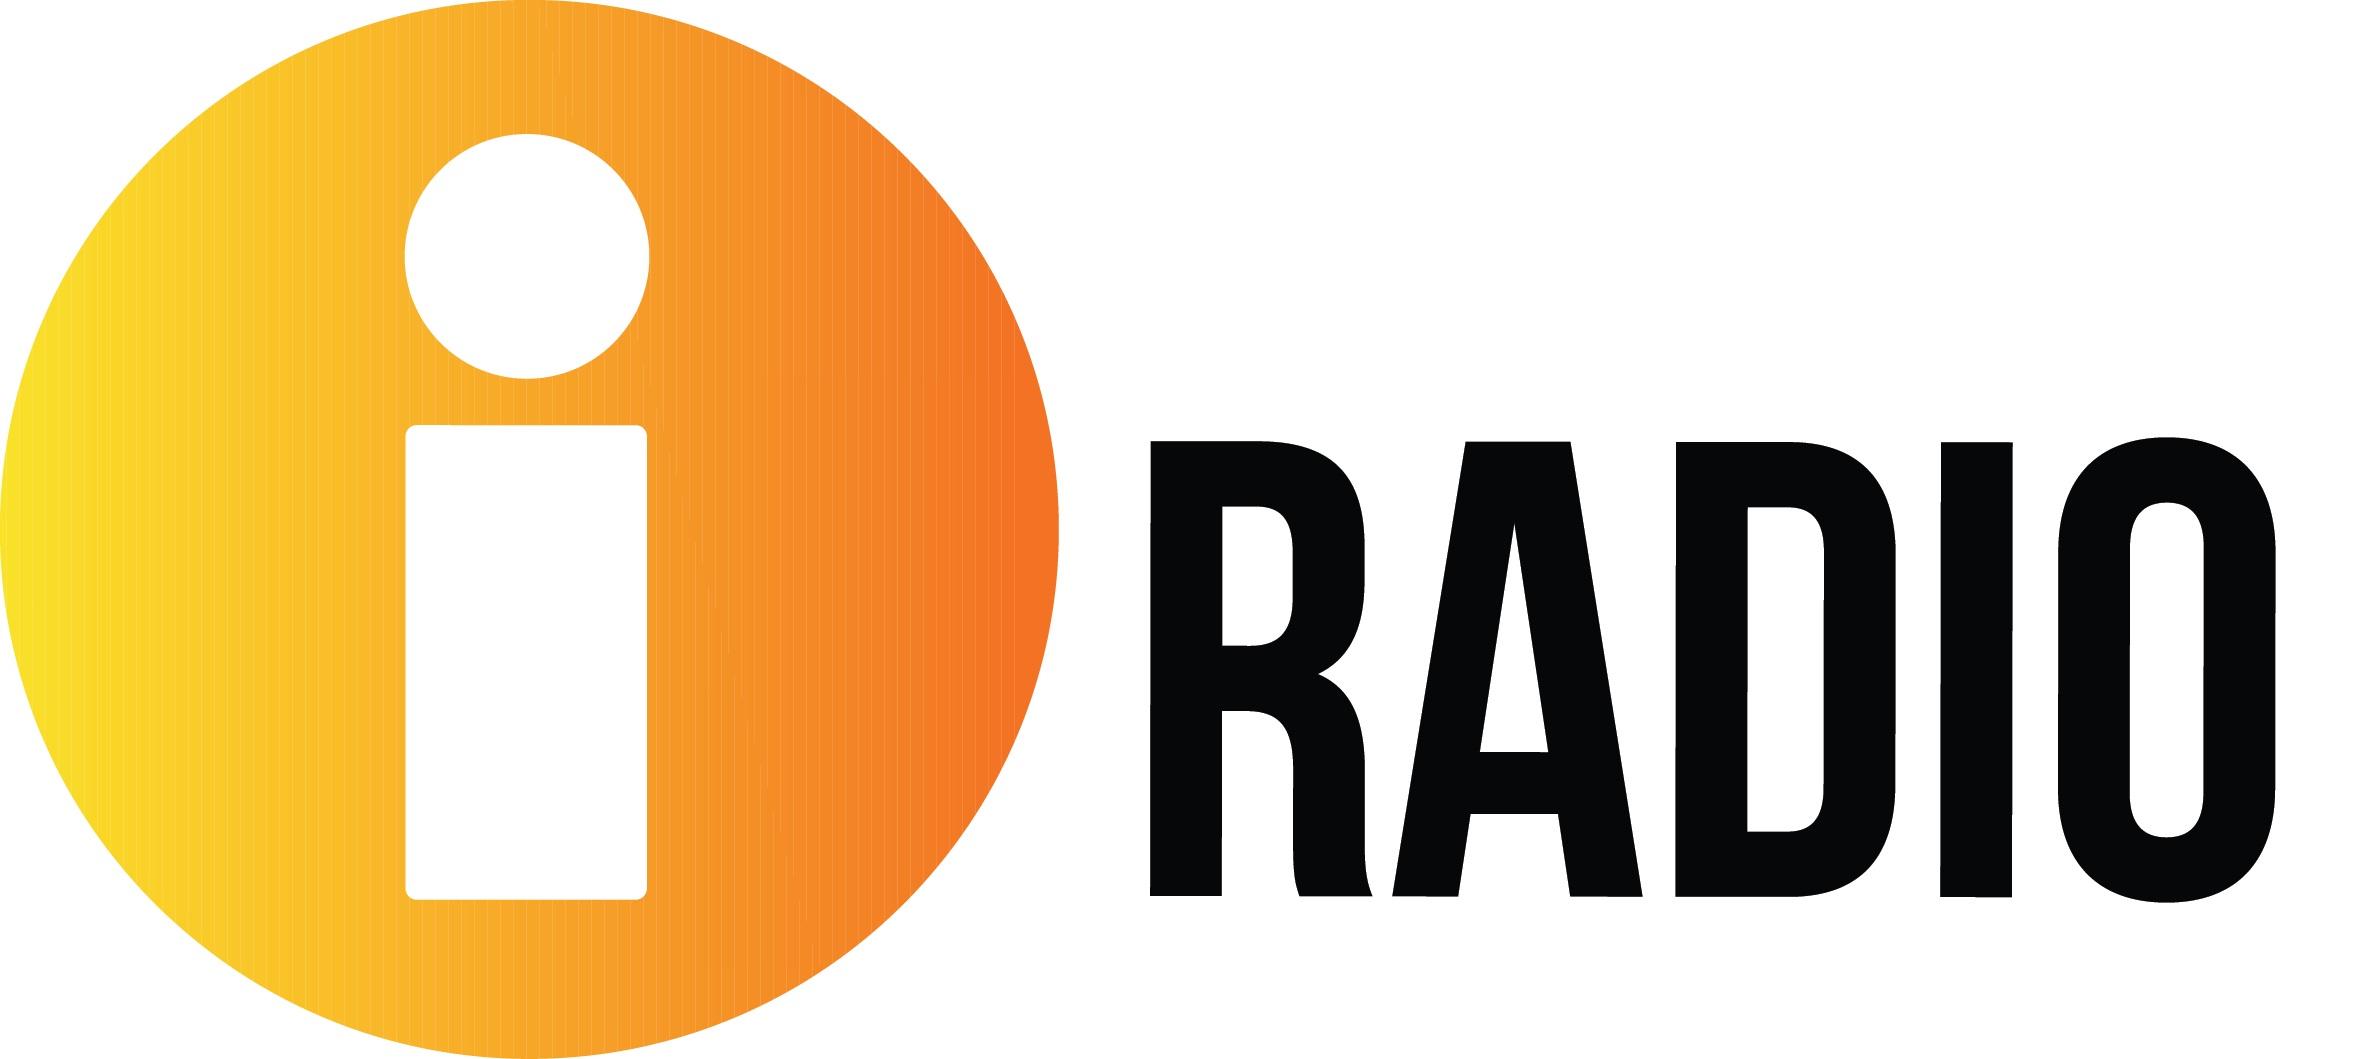 iRadio logo-01 2 copy.png